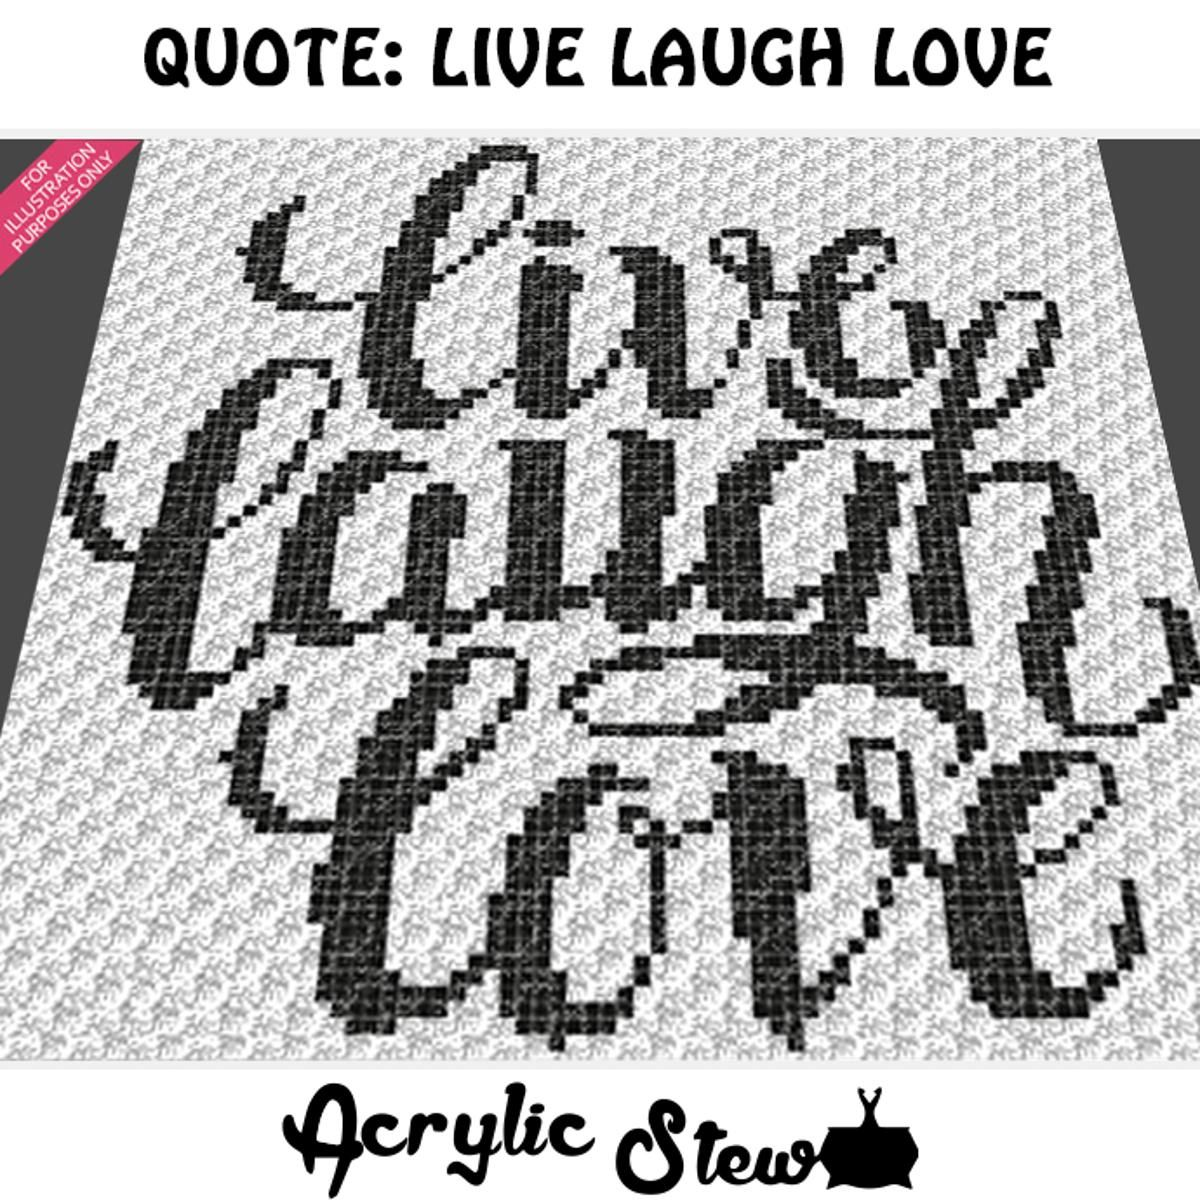 Live Laugh Love Quote (sc tss c2c cross stitch)